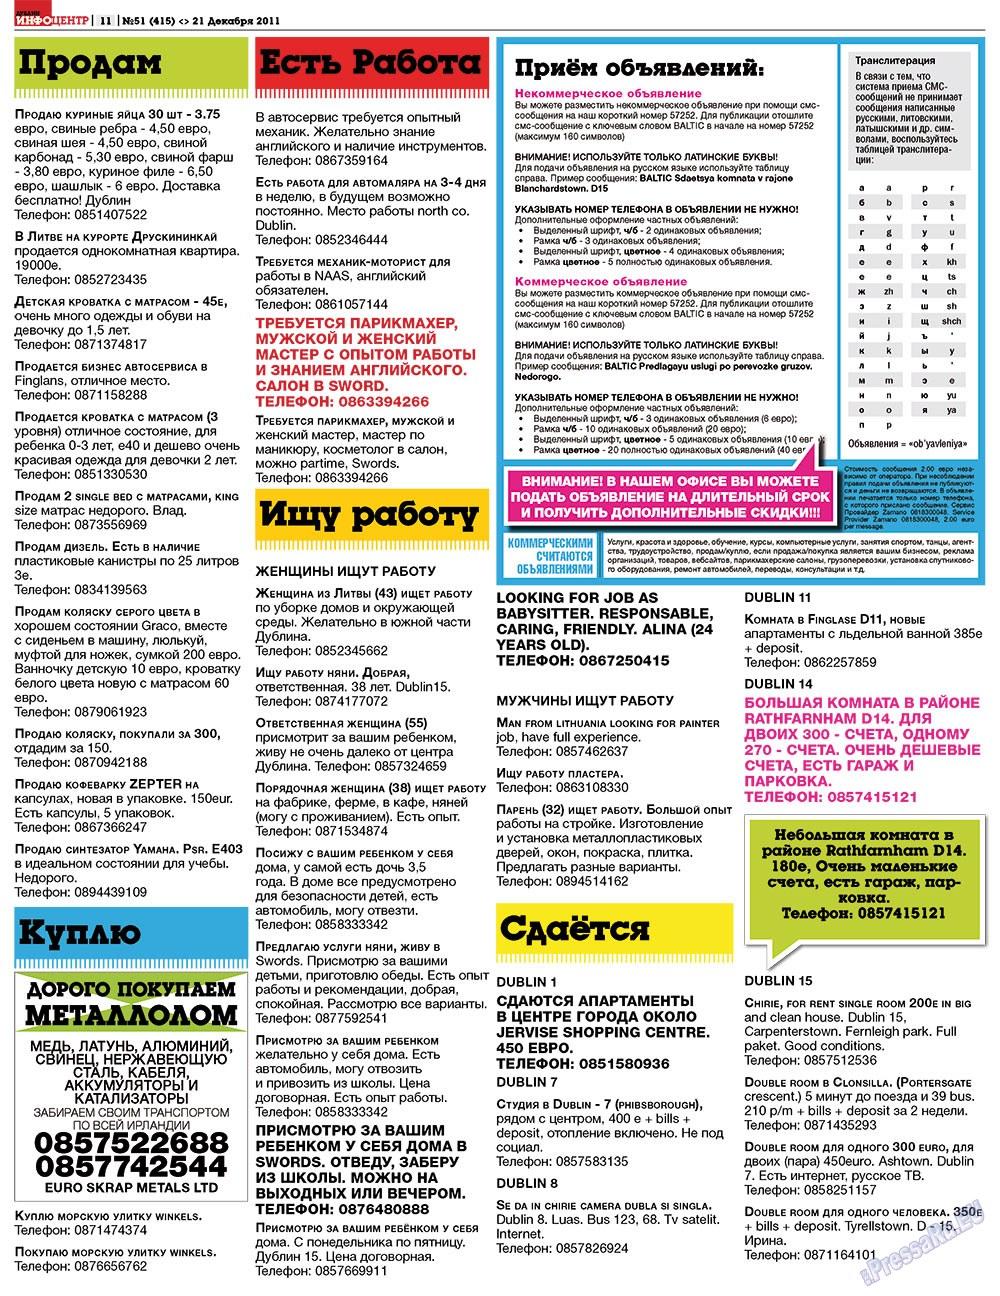 Дублин инфоцентр (газета). 2011 год, номер 51, стр. 11